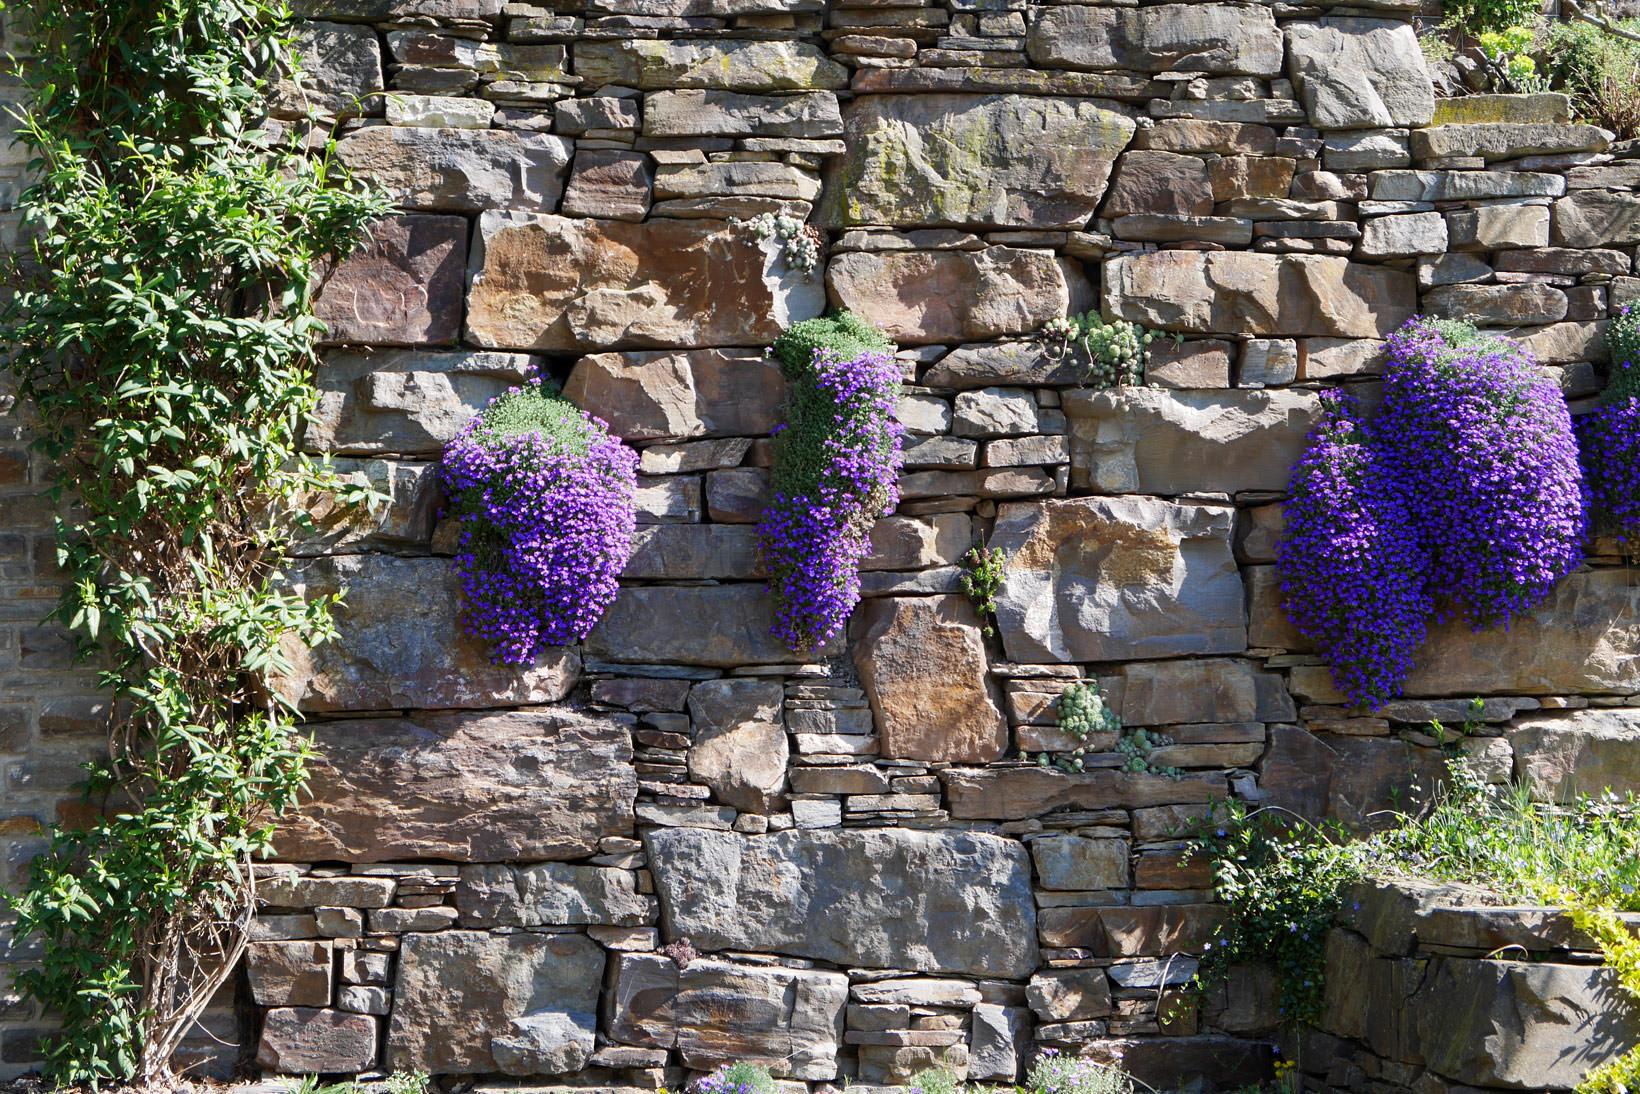 Mauer 10 gartengestaltung pearse danker for Gartengestaltung mauer